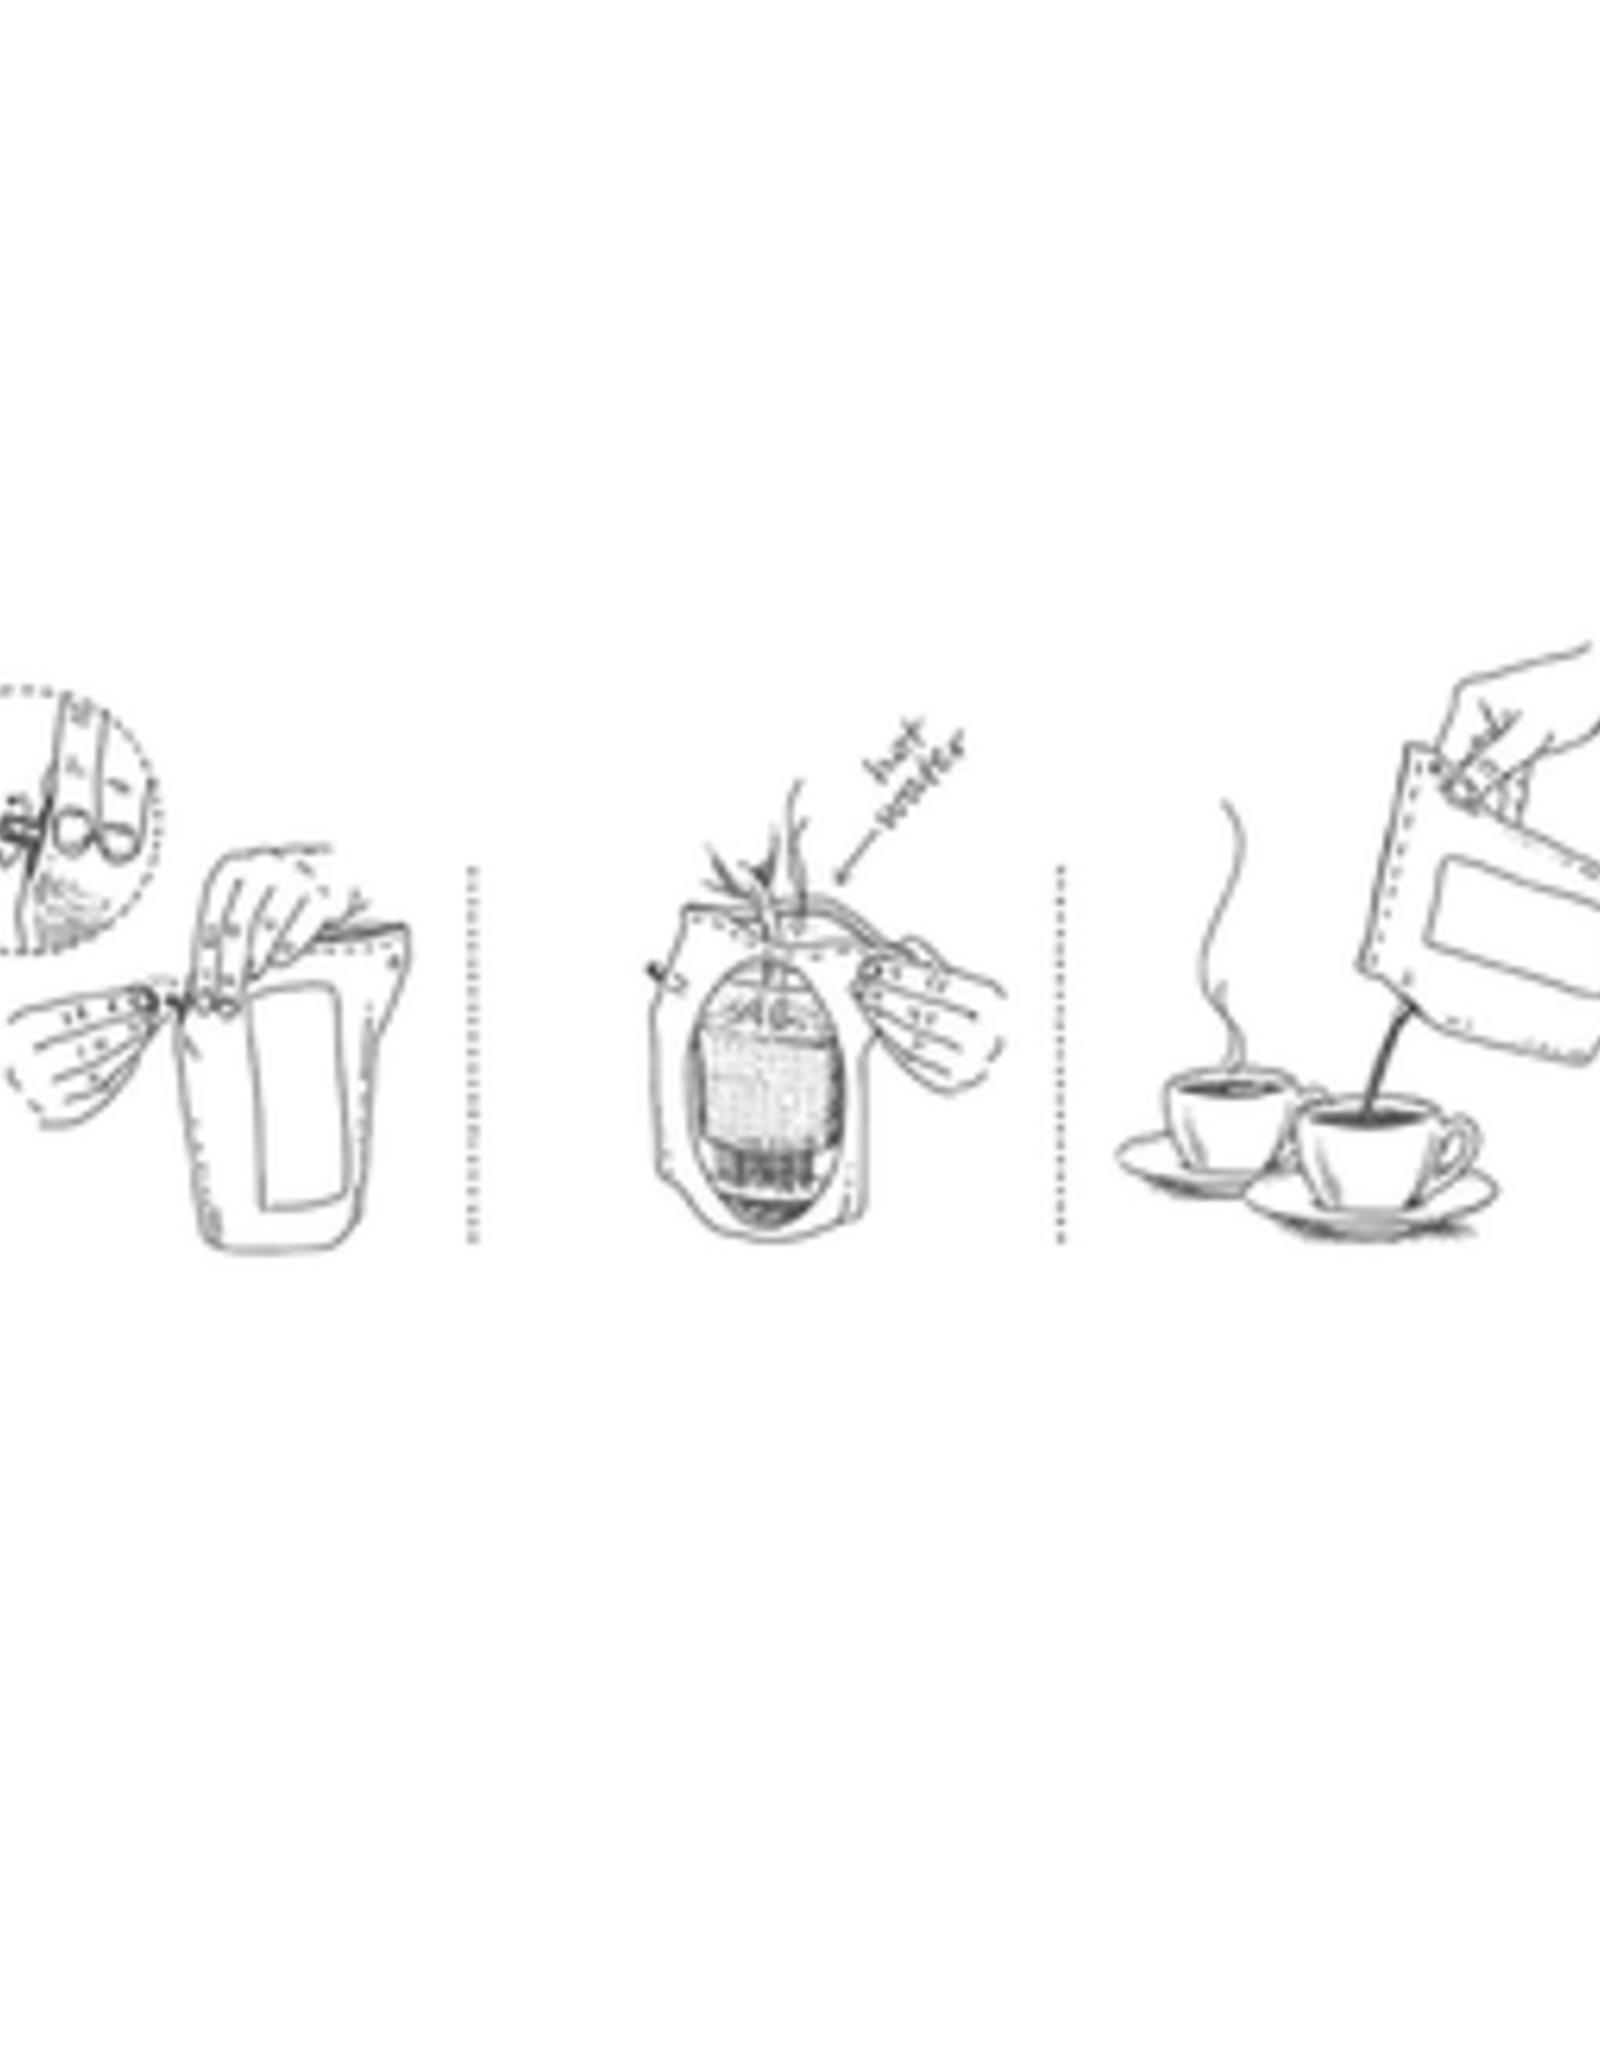 LIV 'N TASTE Van Harte BETERSCHAP - TeaBrewer Gift